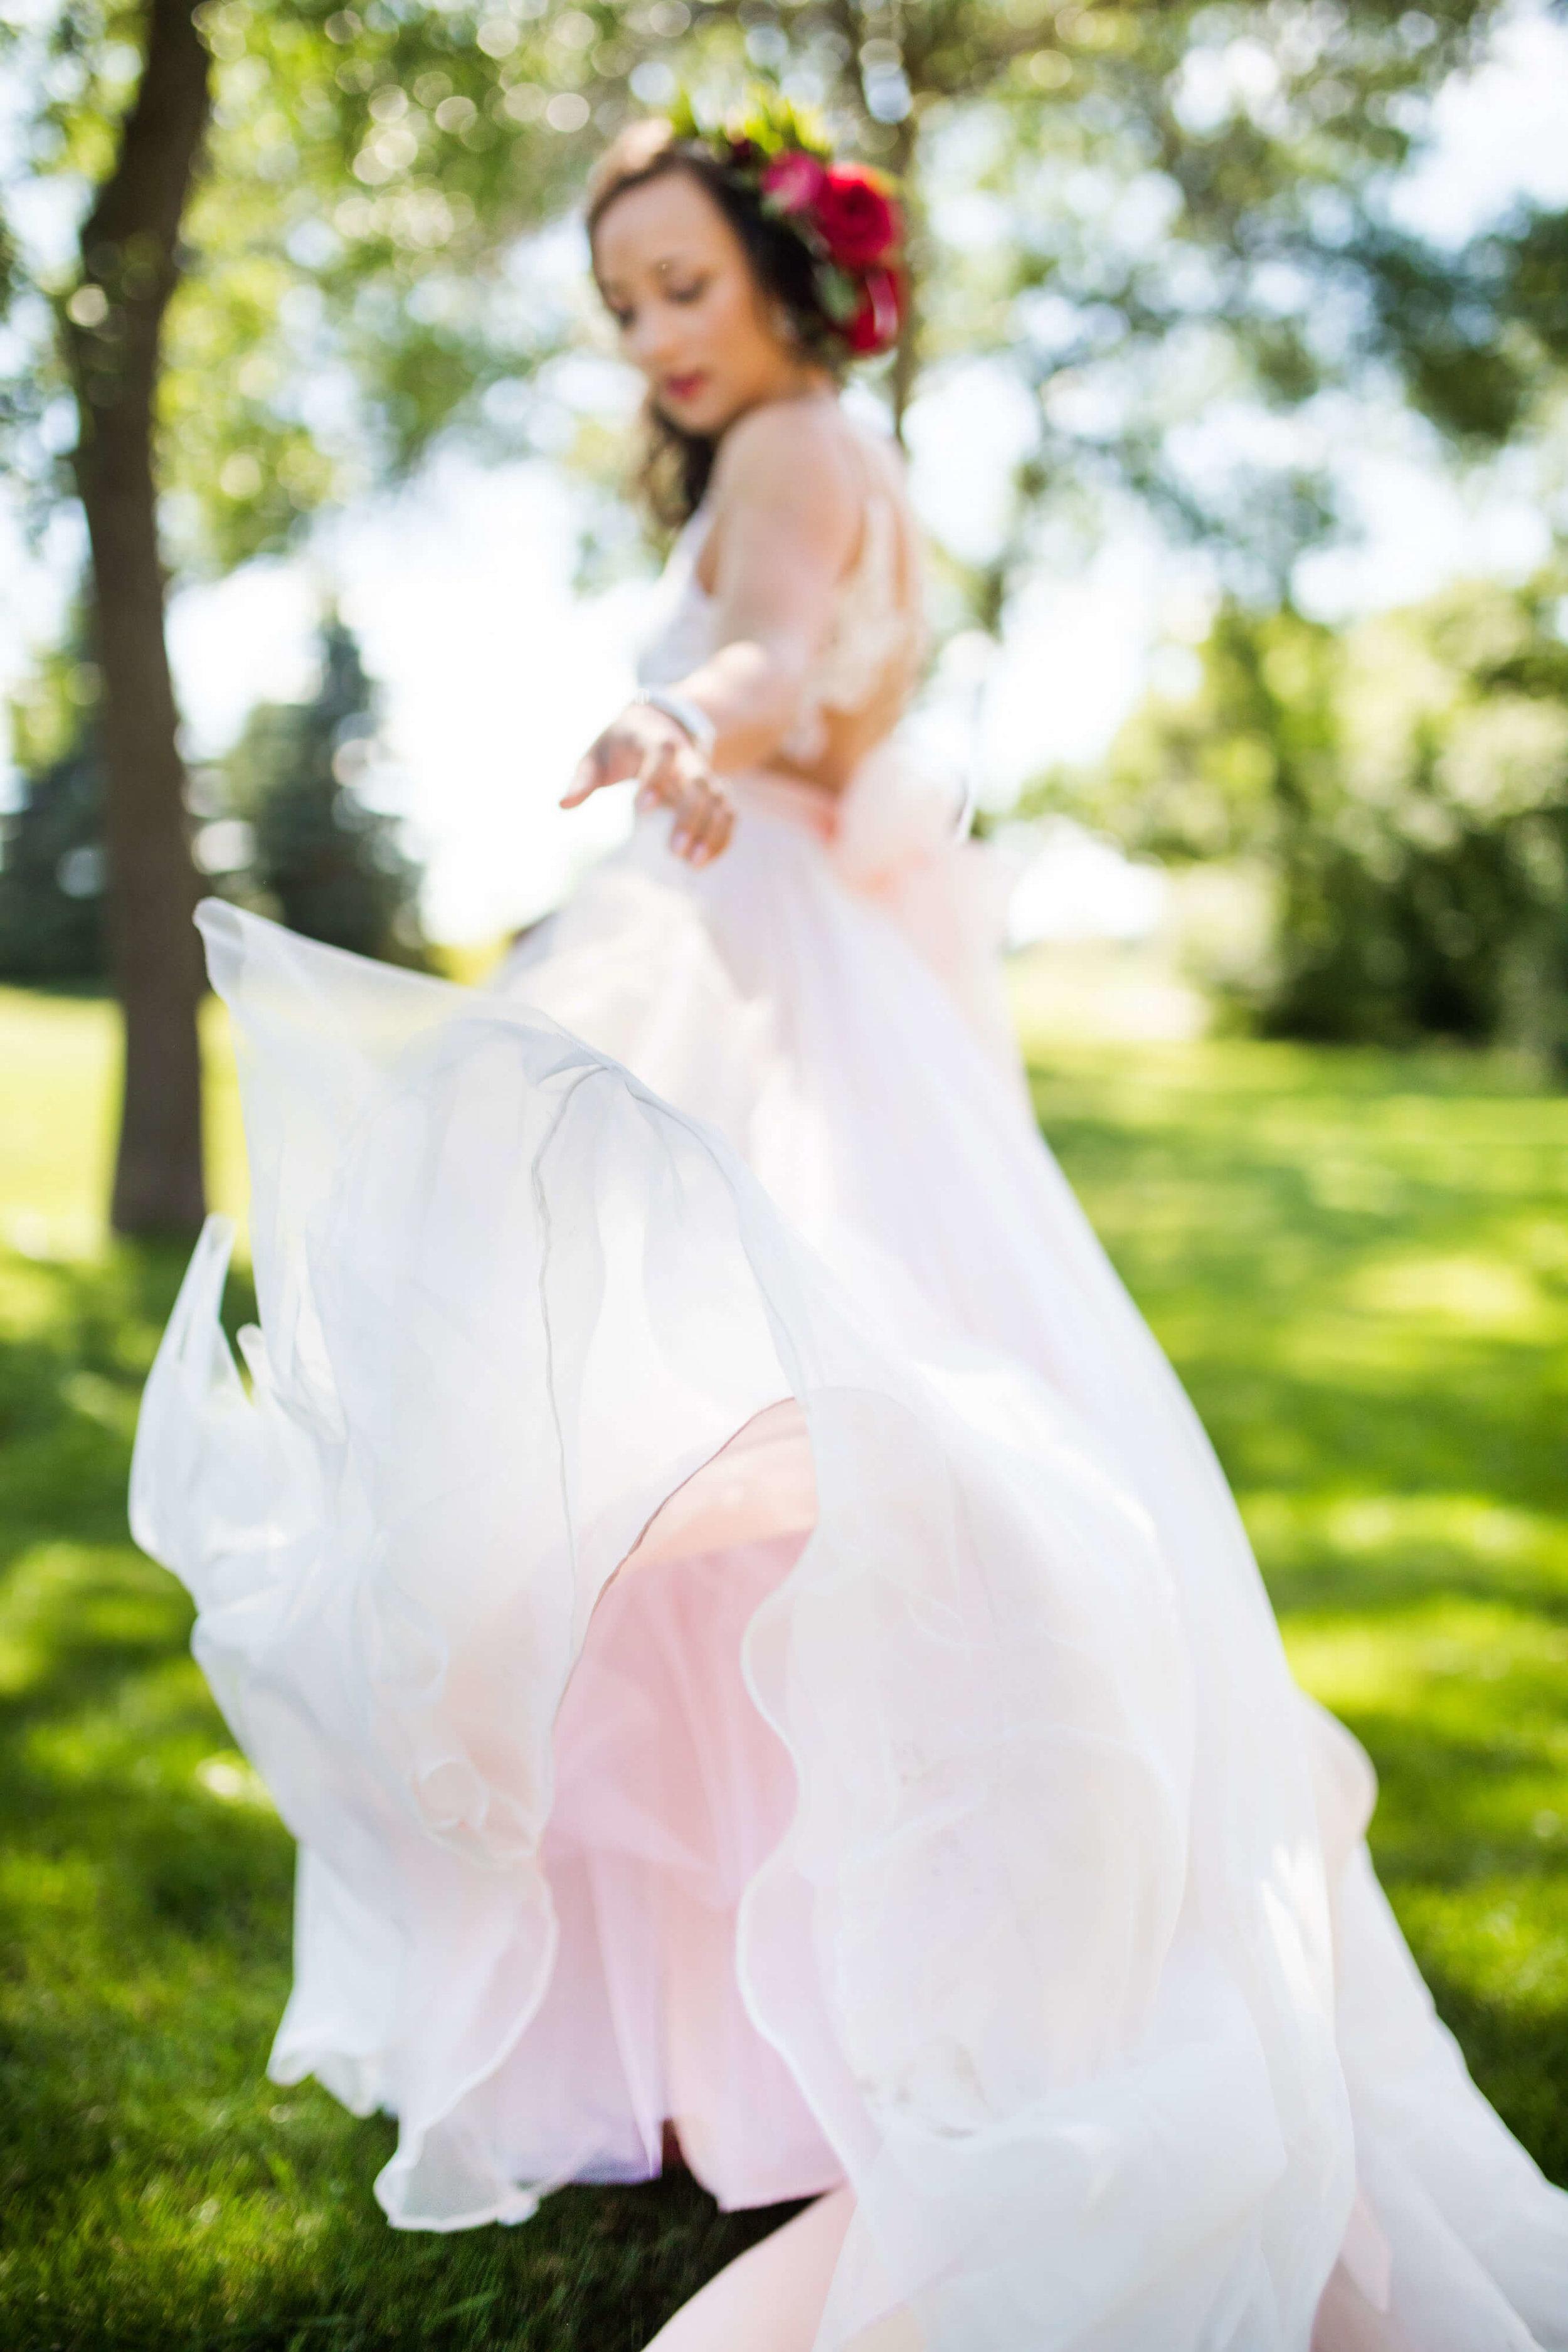 pink underlay wedding dress | Minnesota wedding photographer Studio KH wedding dress details | wedding blog | Sixpence Events 70 Ways to Photograph Your Wedding Dress.jpg